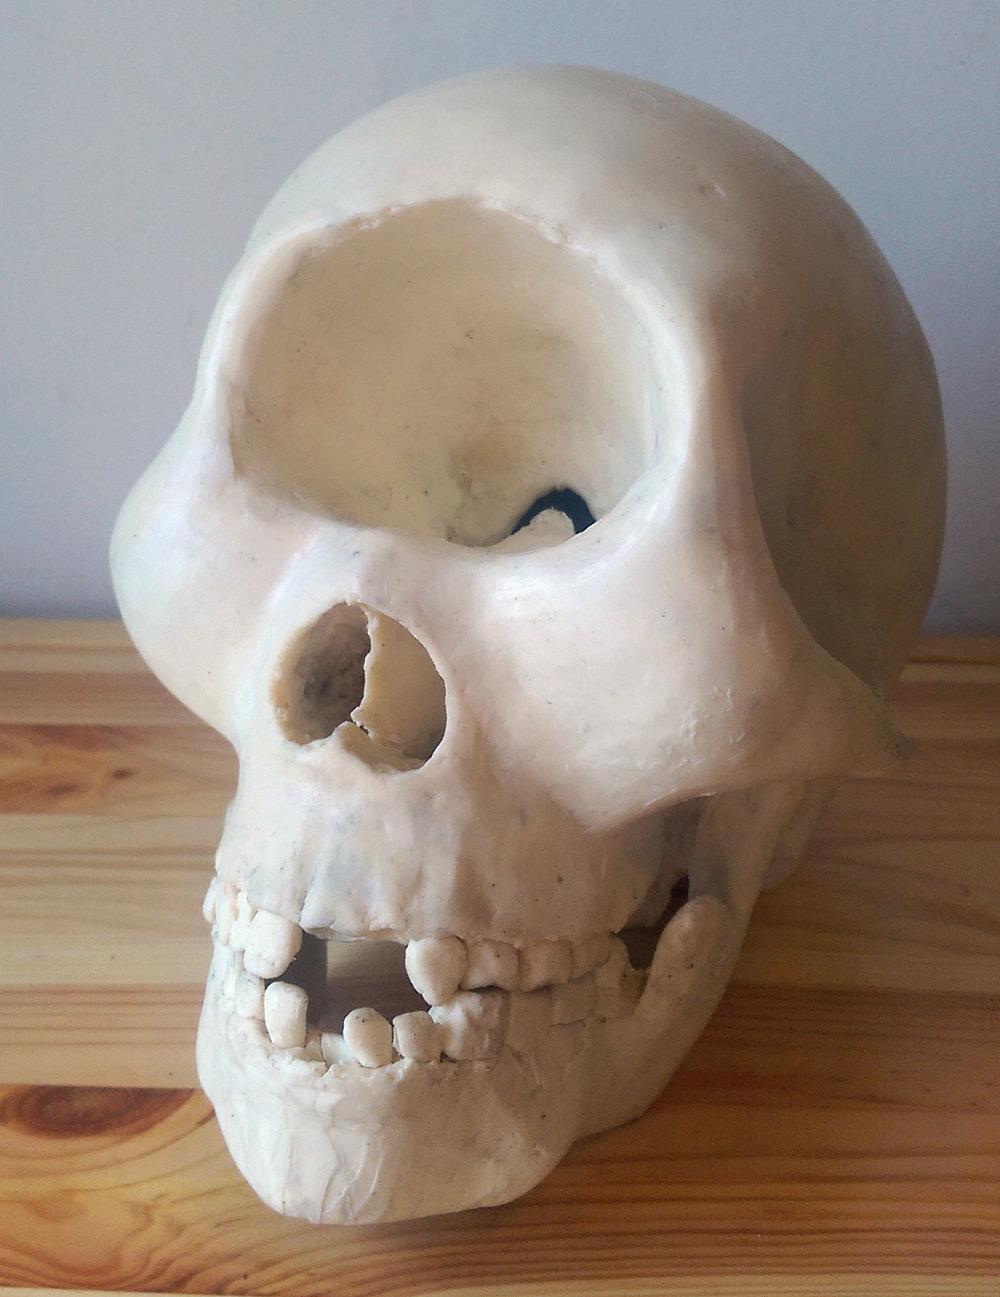 cyclopse skull.jpg